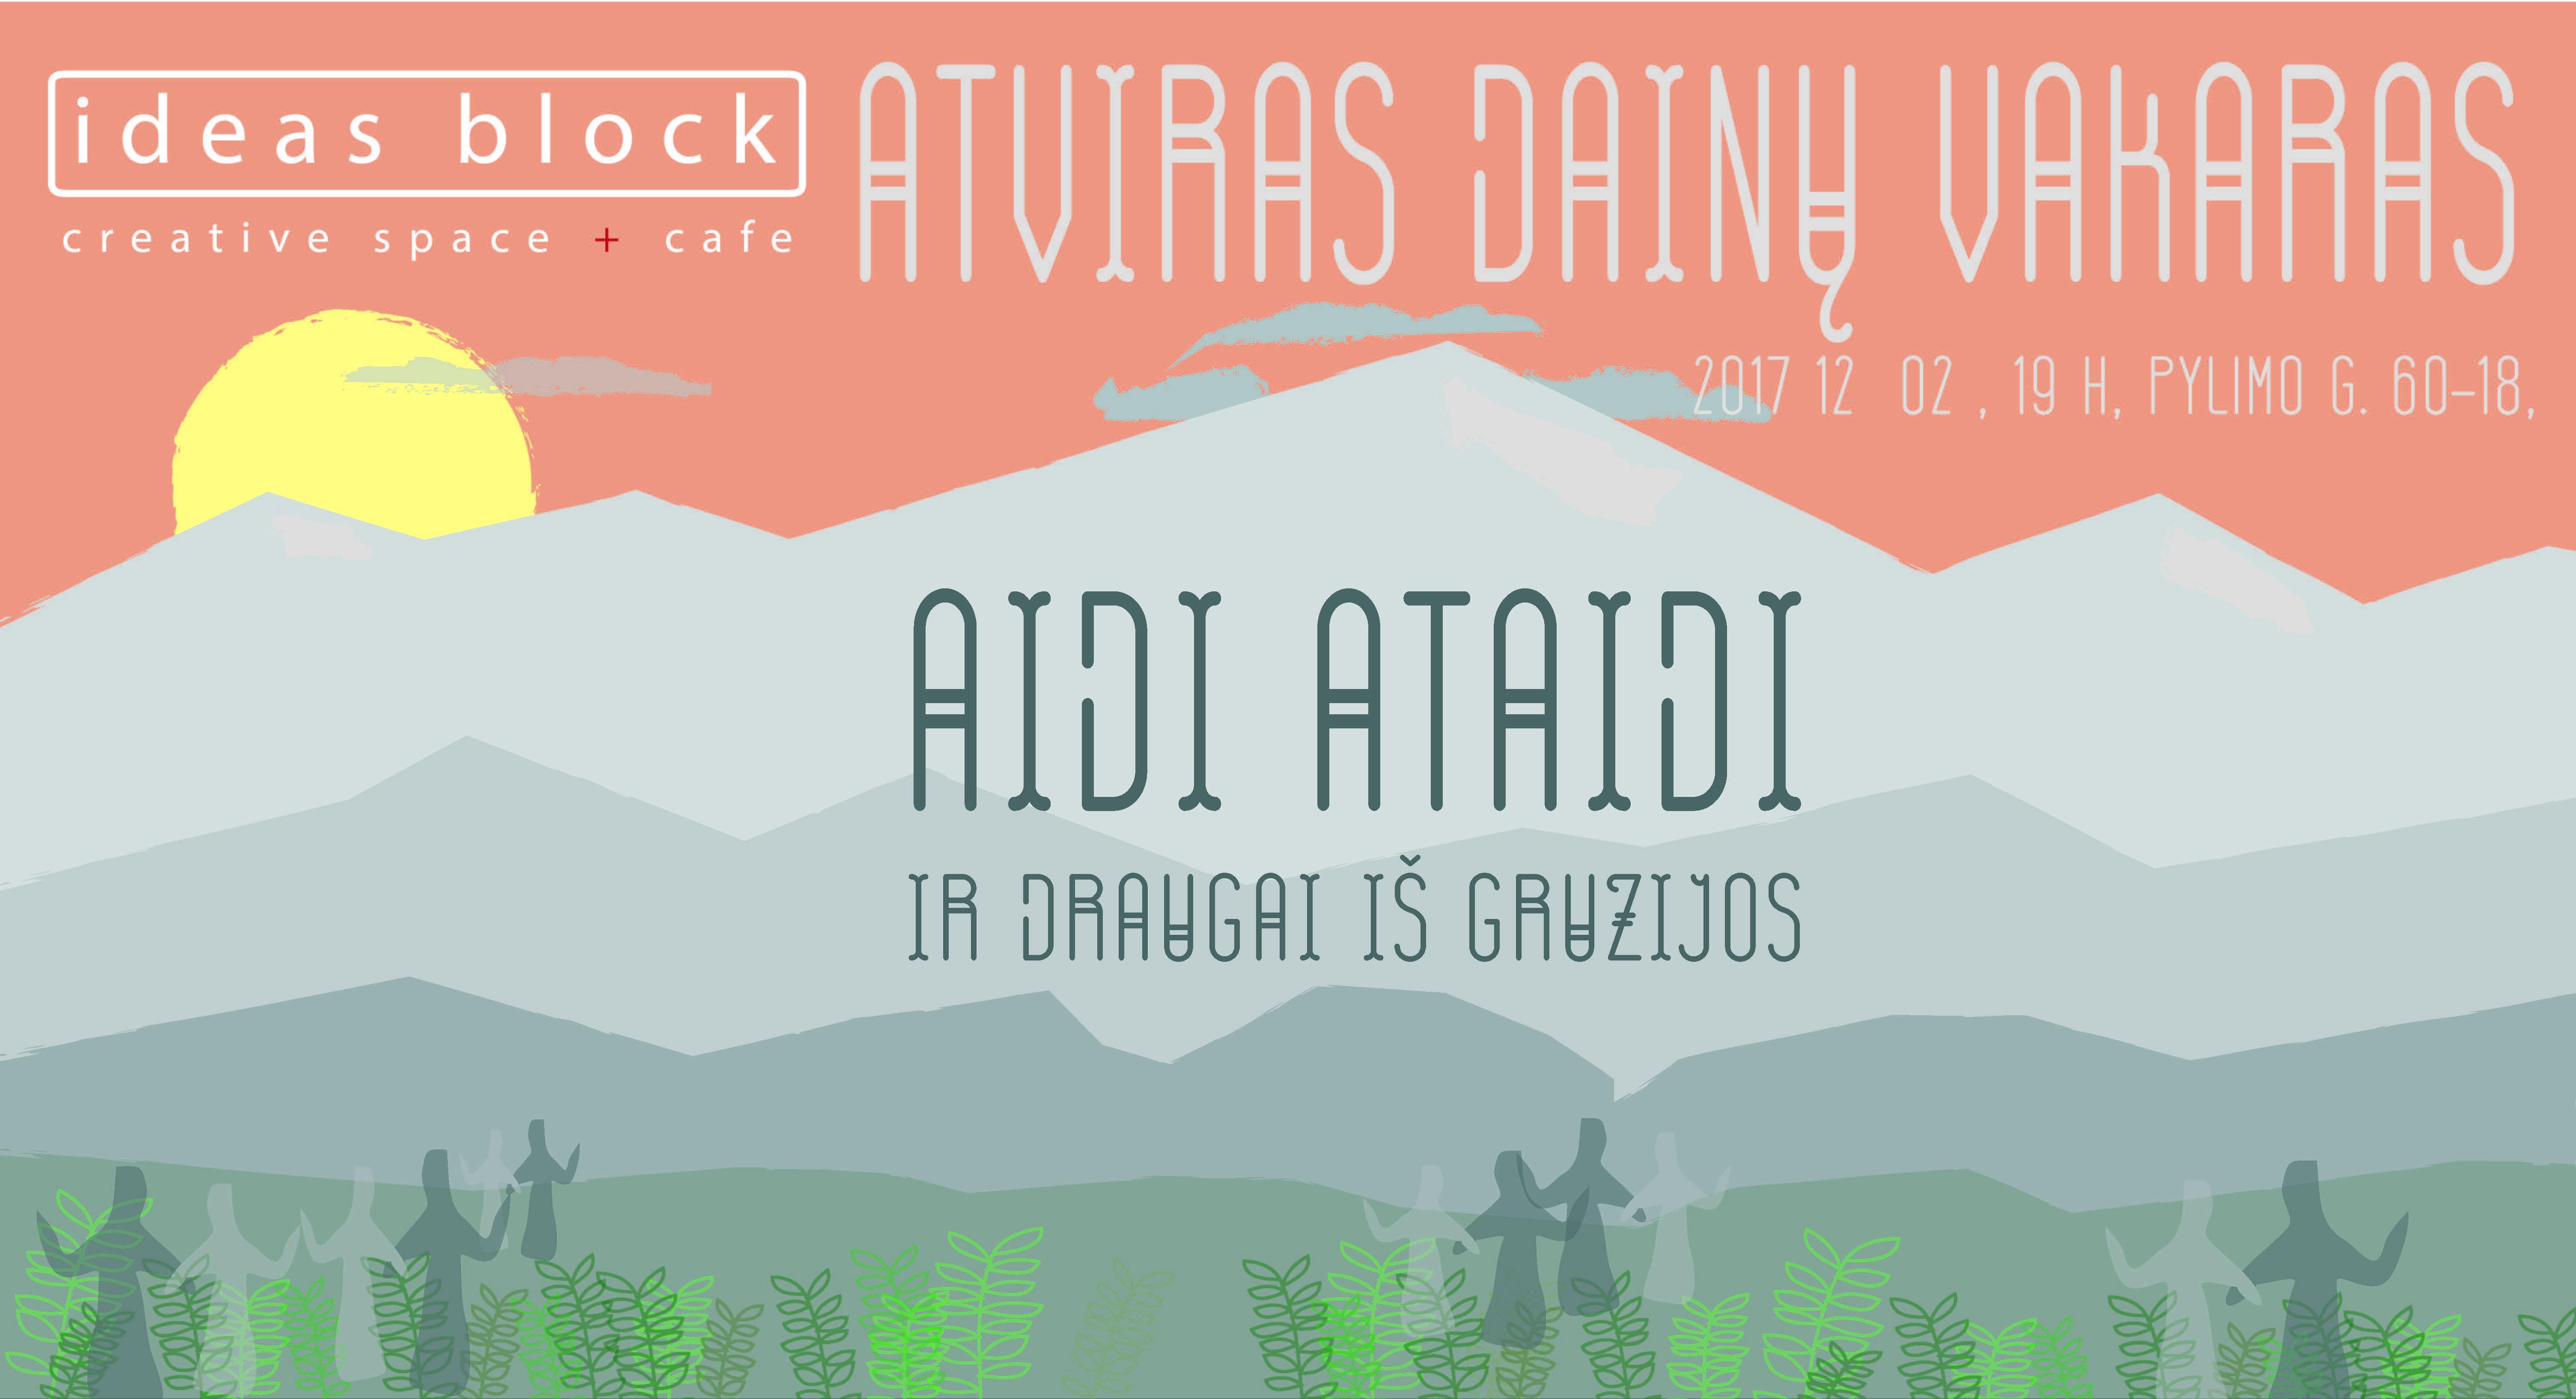 Aidi ataidi - folk songs